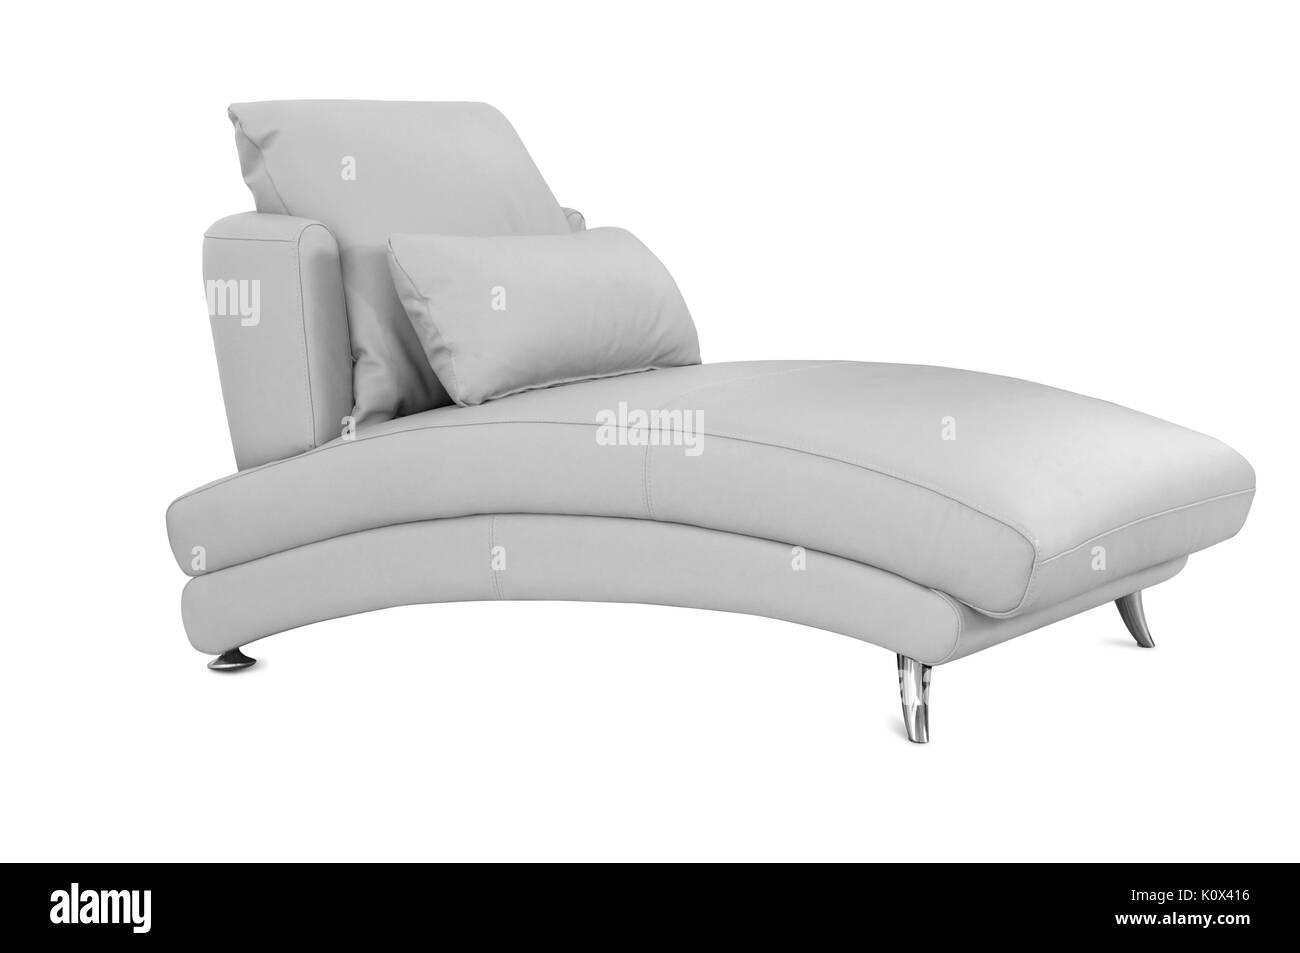 La Chaise Longue Billard chaise black and white stock photos & images - alamy